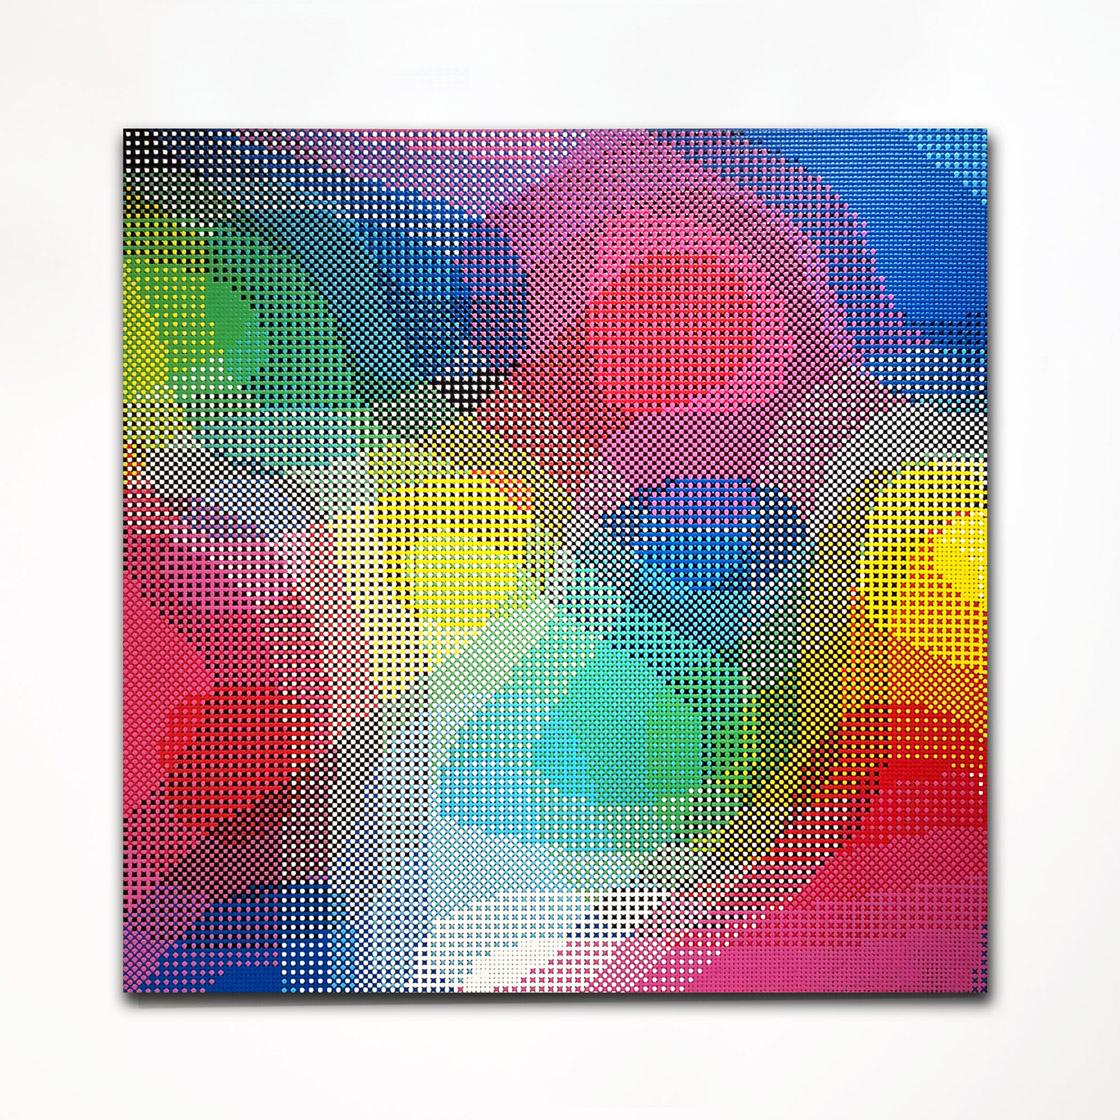 William Betts, Crossfade, ColorSpace XXX, 48x48, 2017